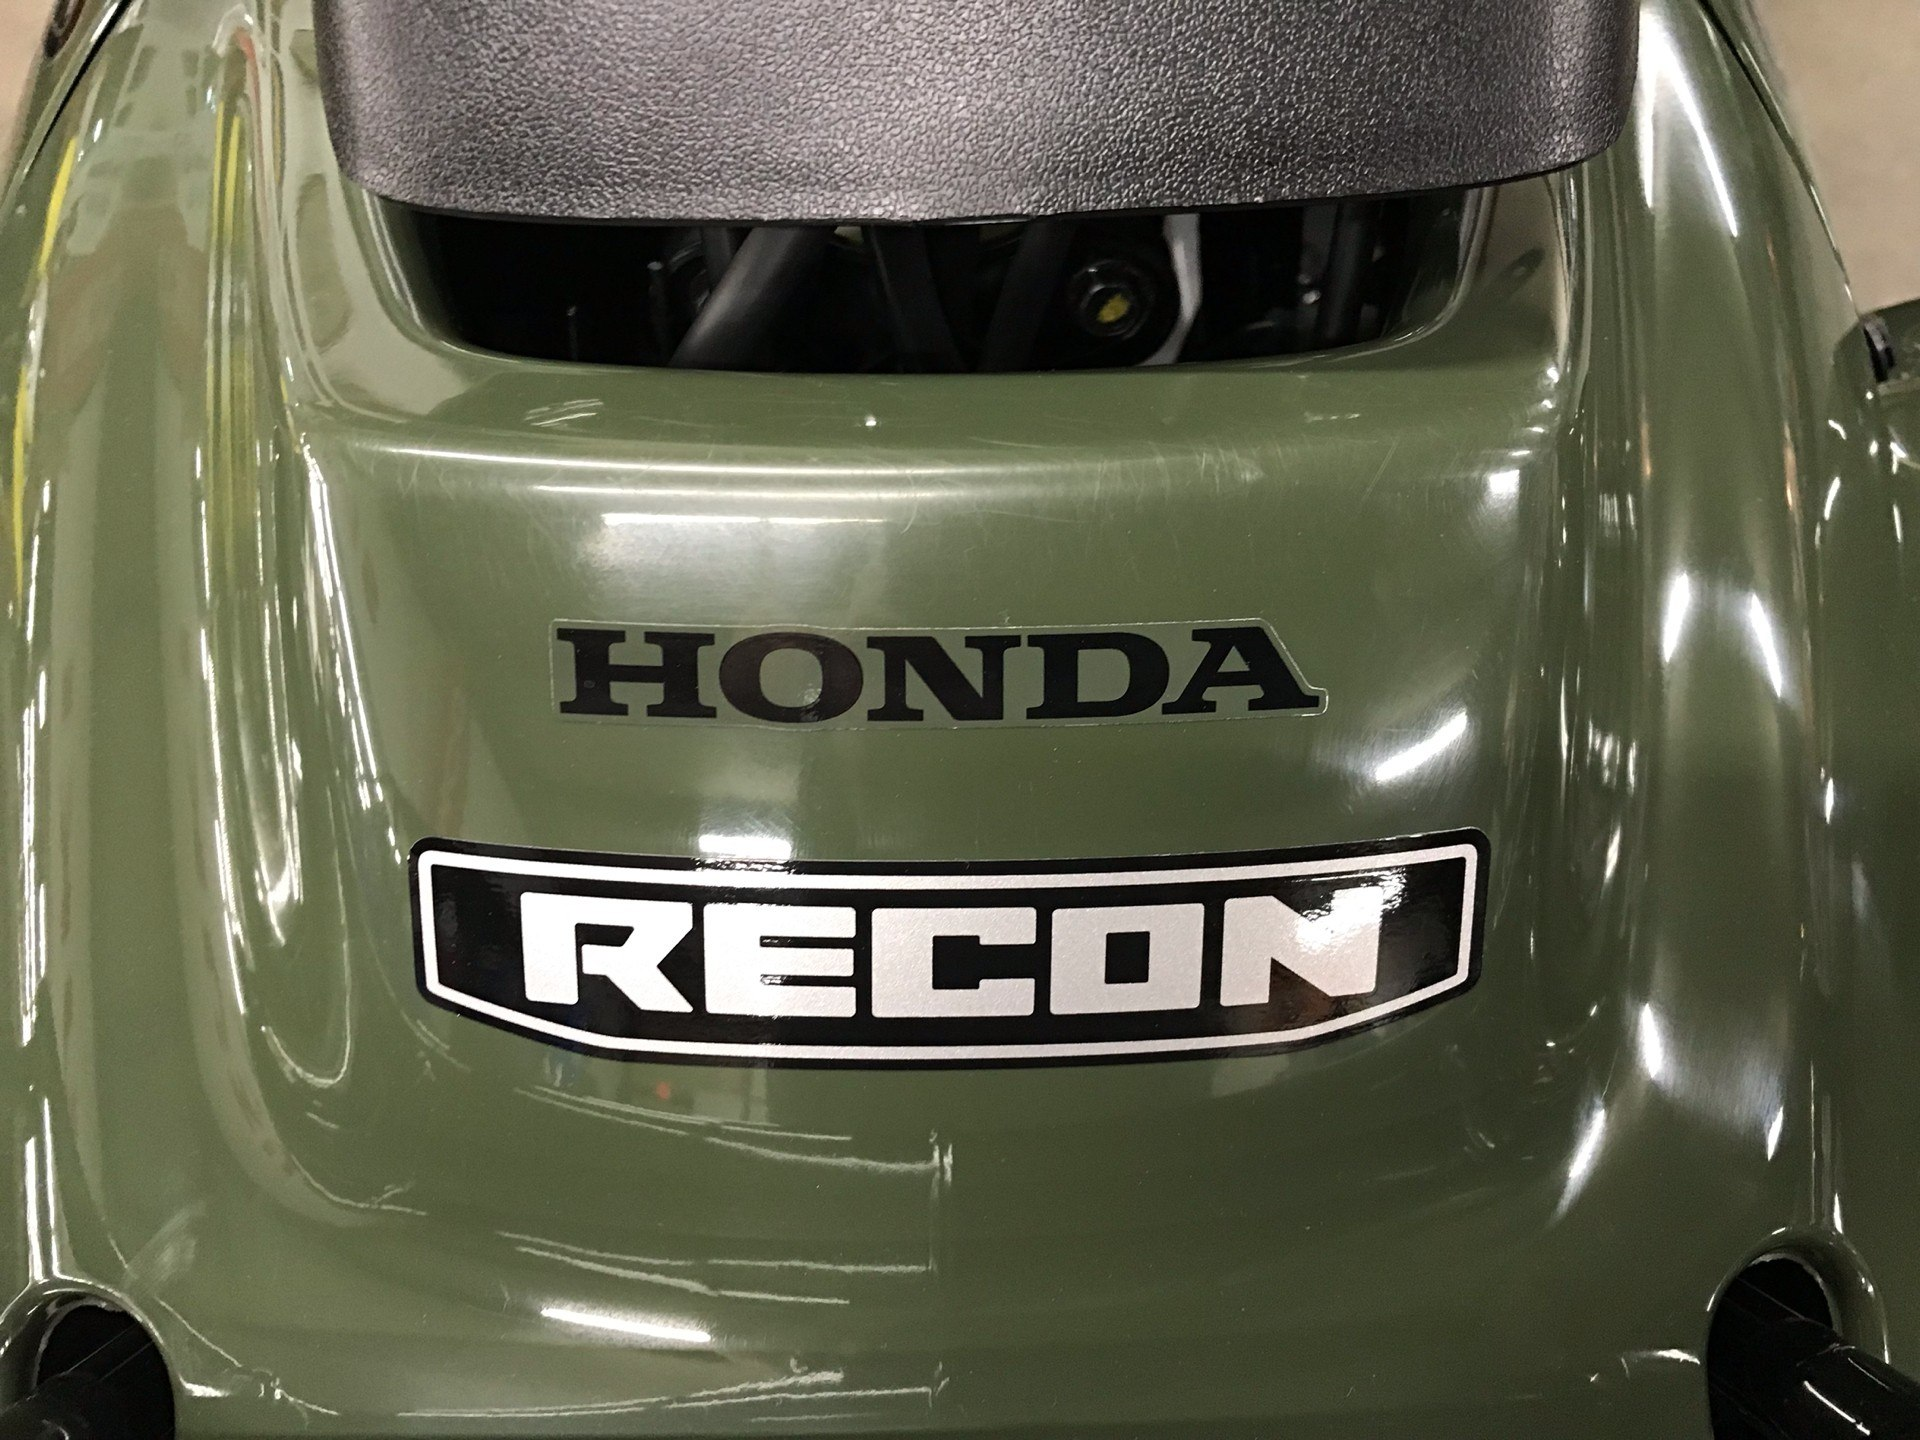 2019 Honda FourTrax Recon 10